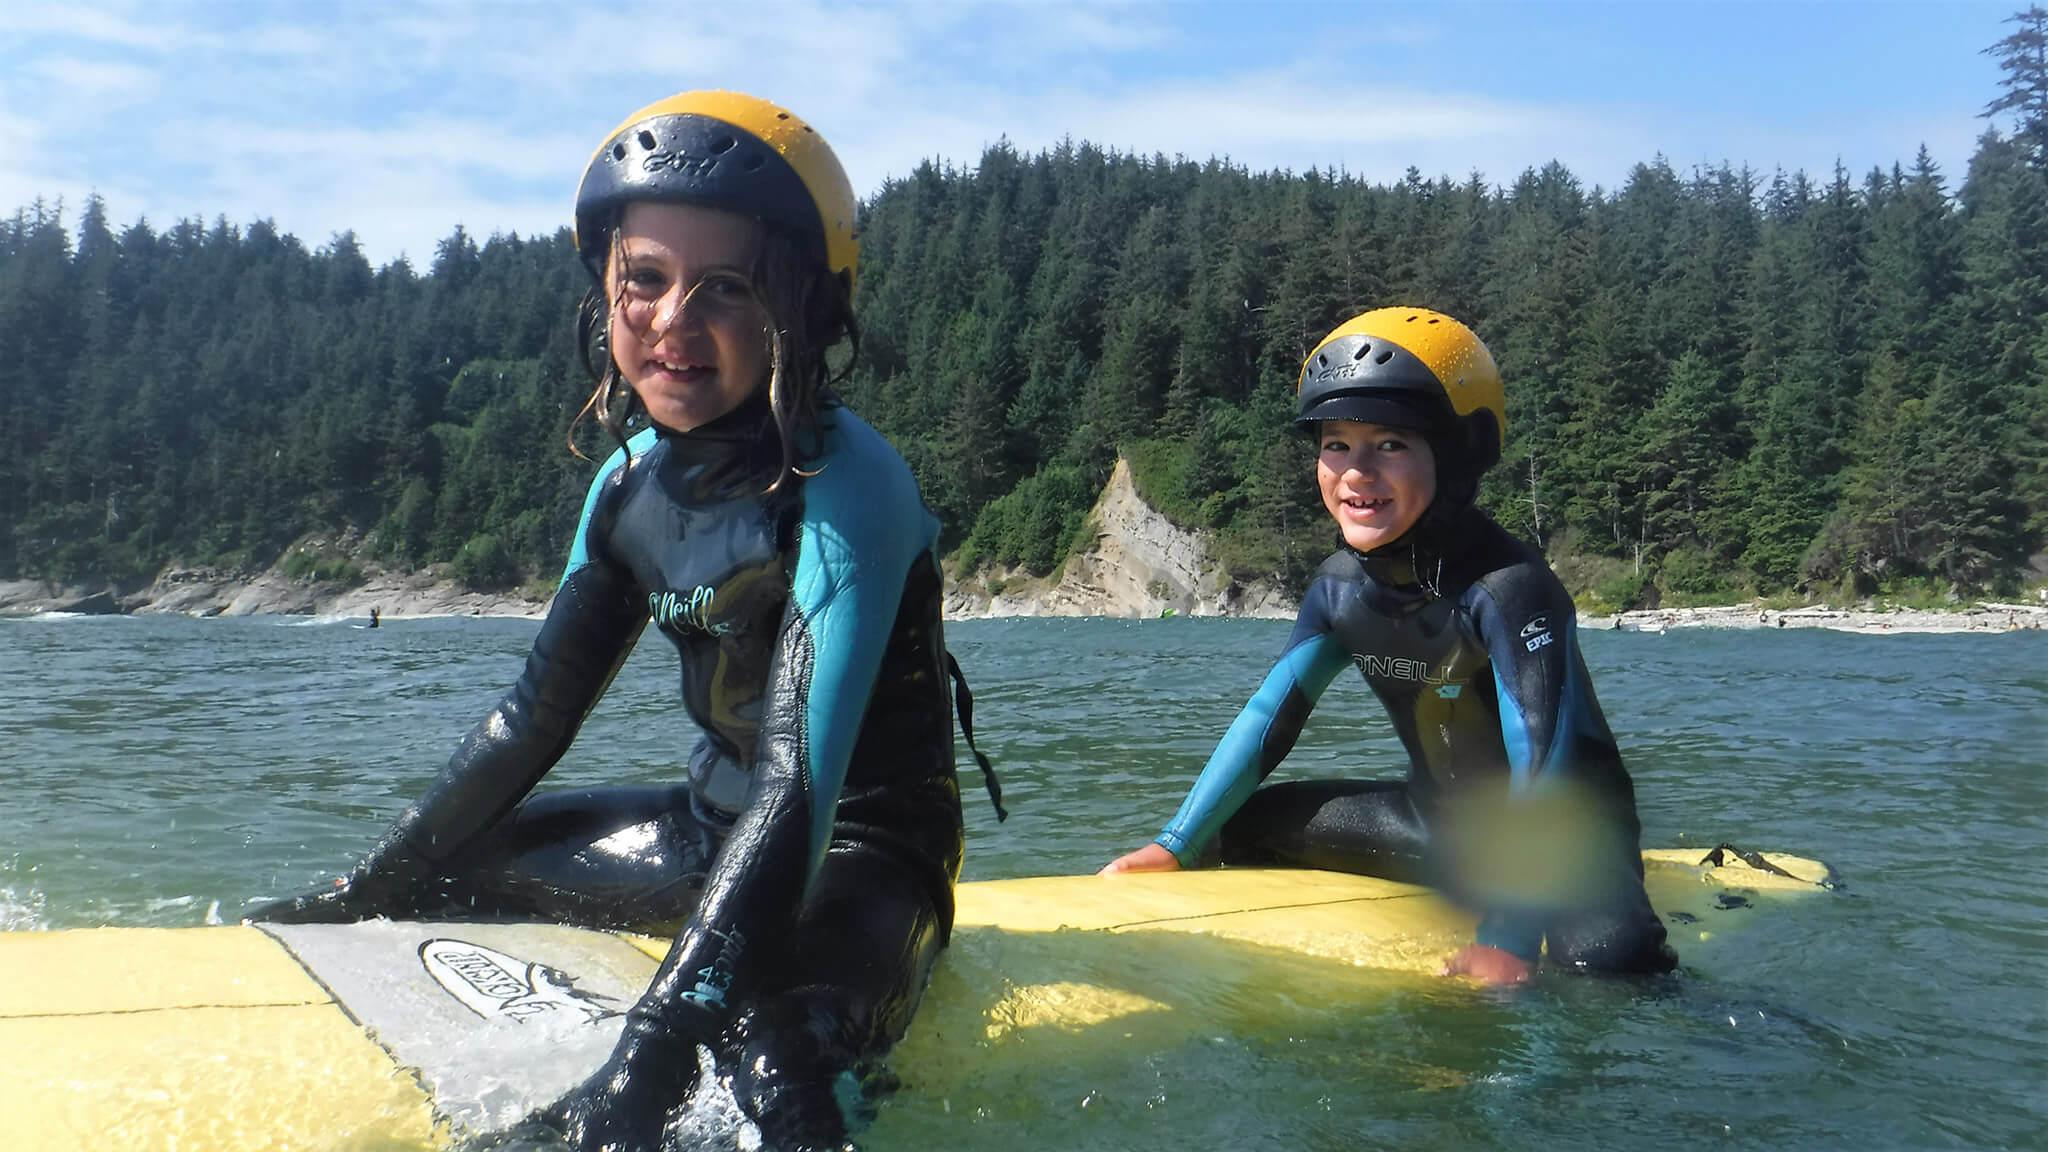 KID'S SURF & BODYBOARDING LESSONS